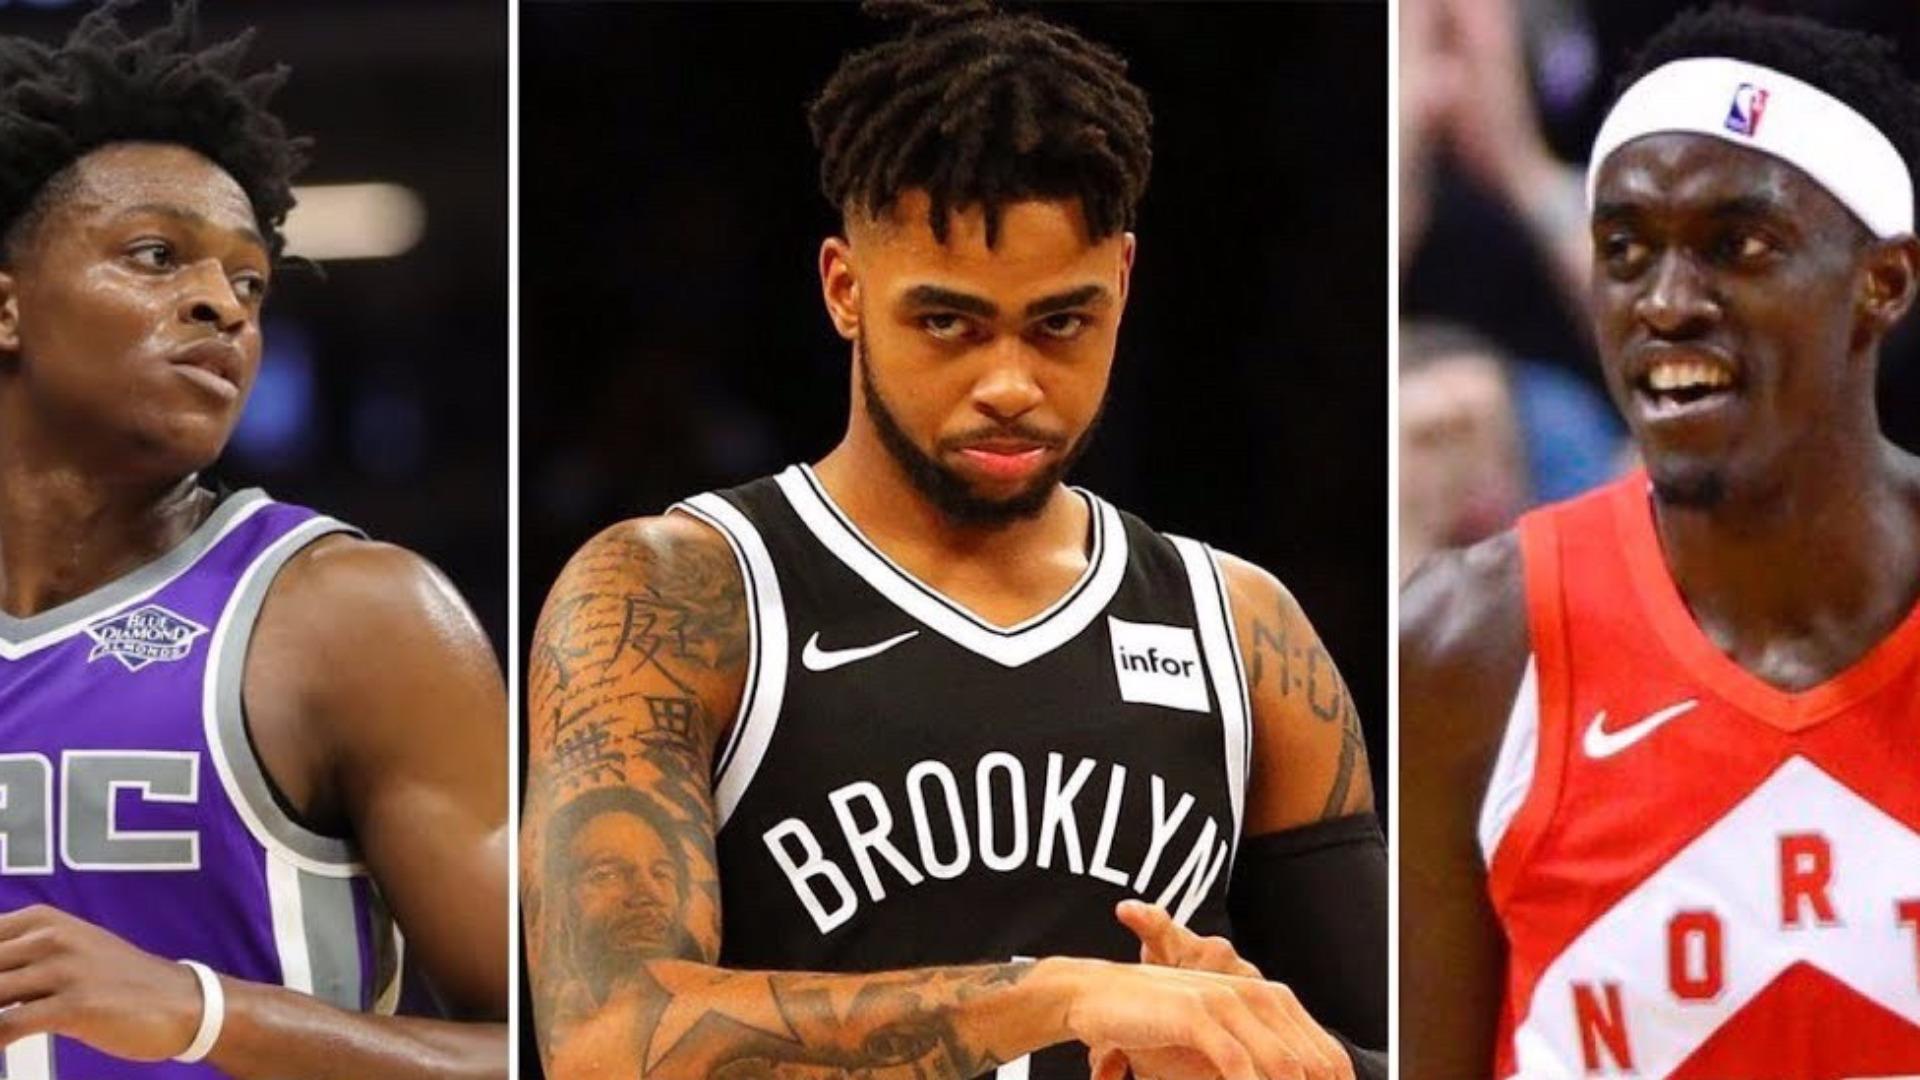 Kia NBA Most Improved Player